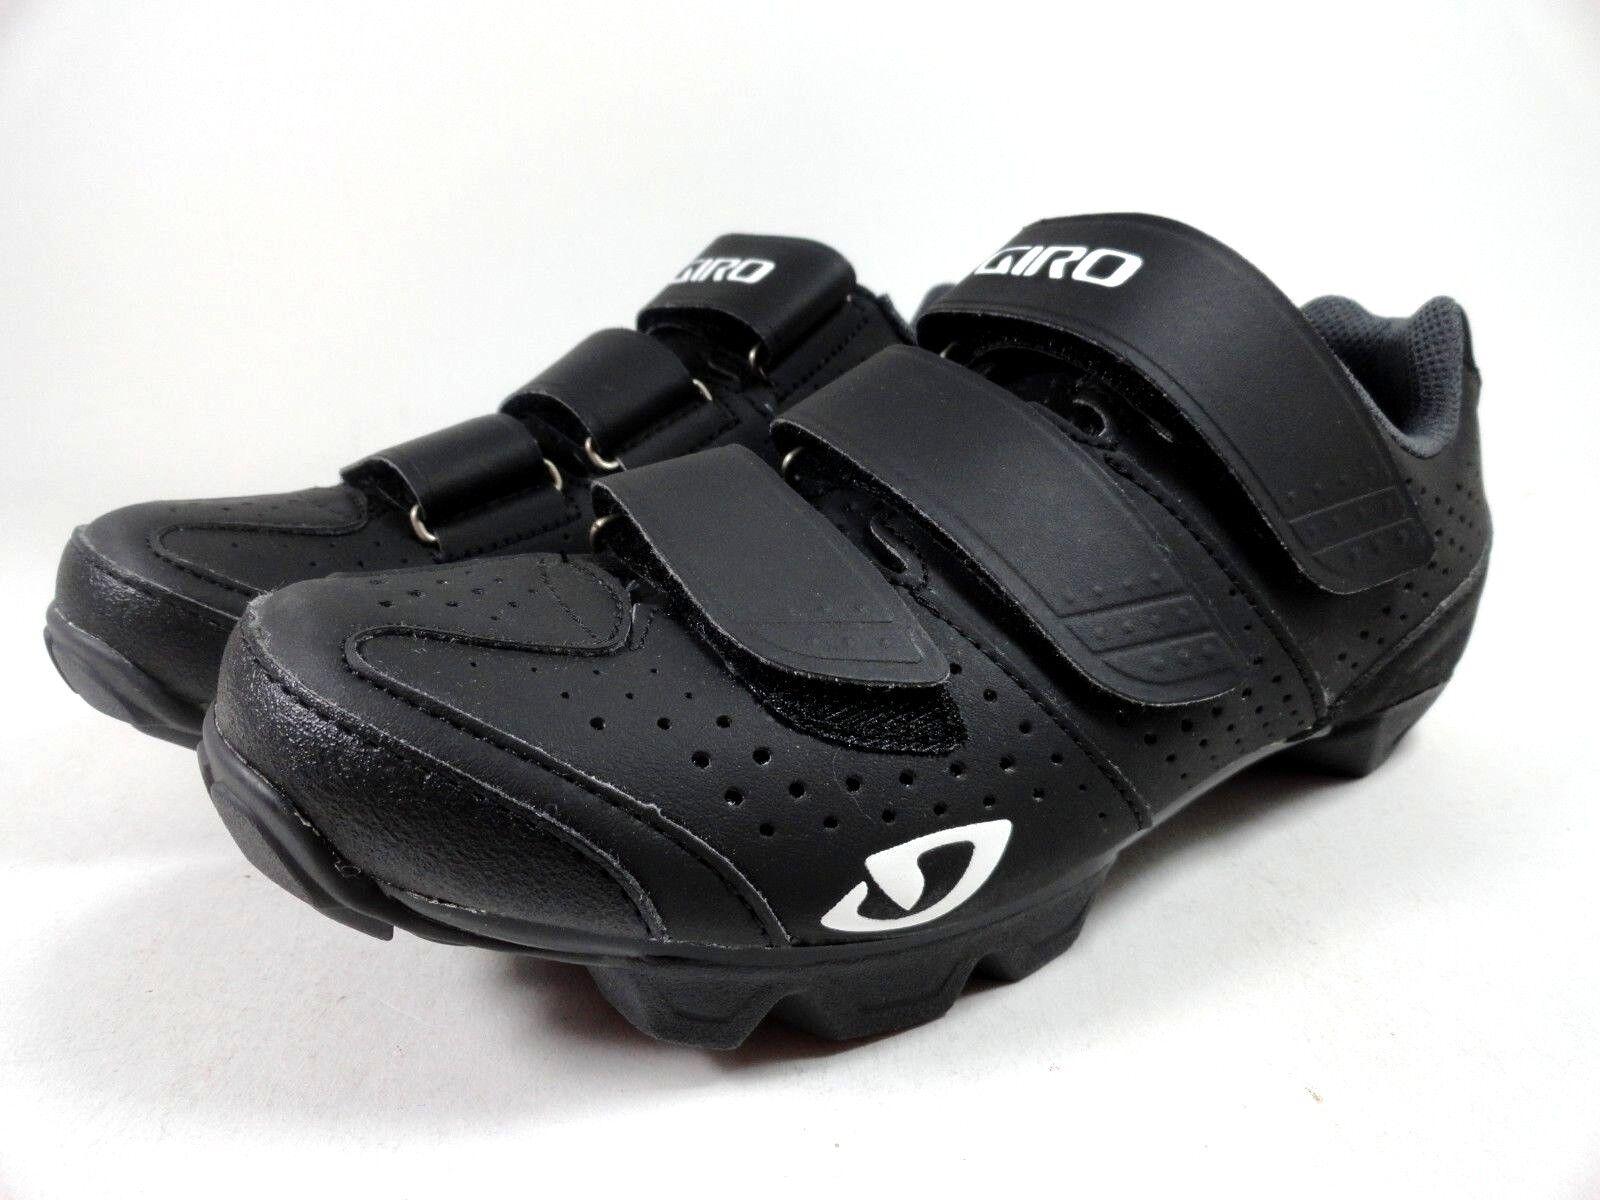 new riela r mtb mountain bike shoes